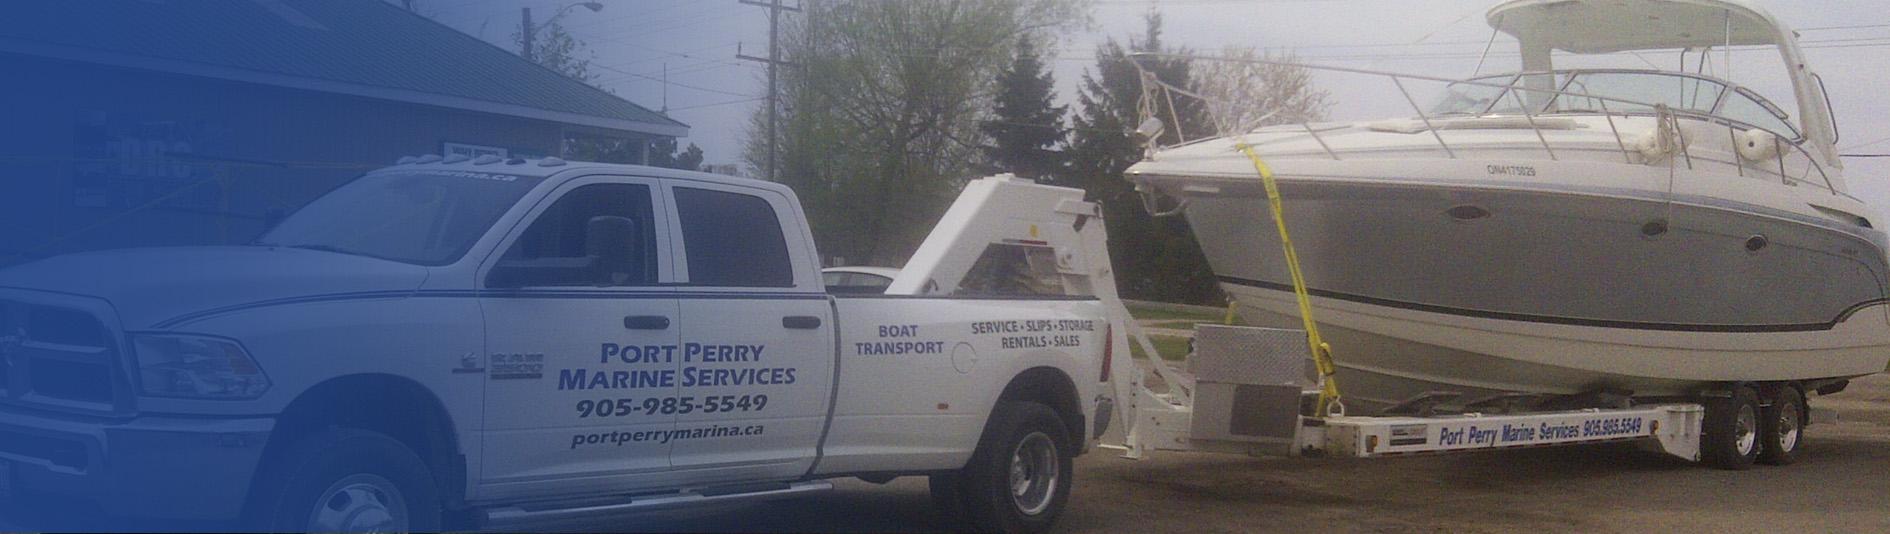 Toronto, Greater Toronto Area & GTA boat transport